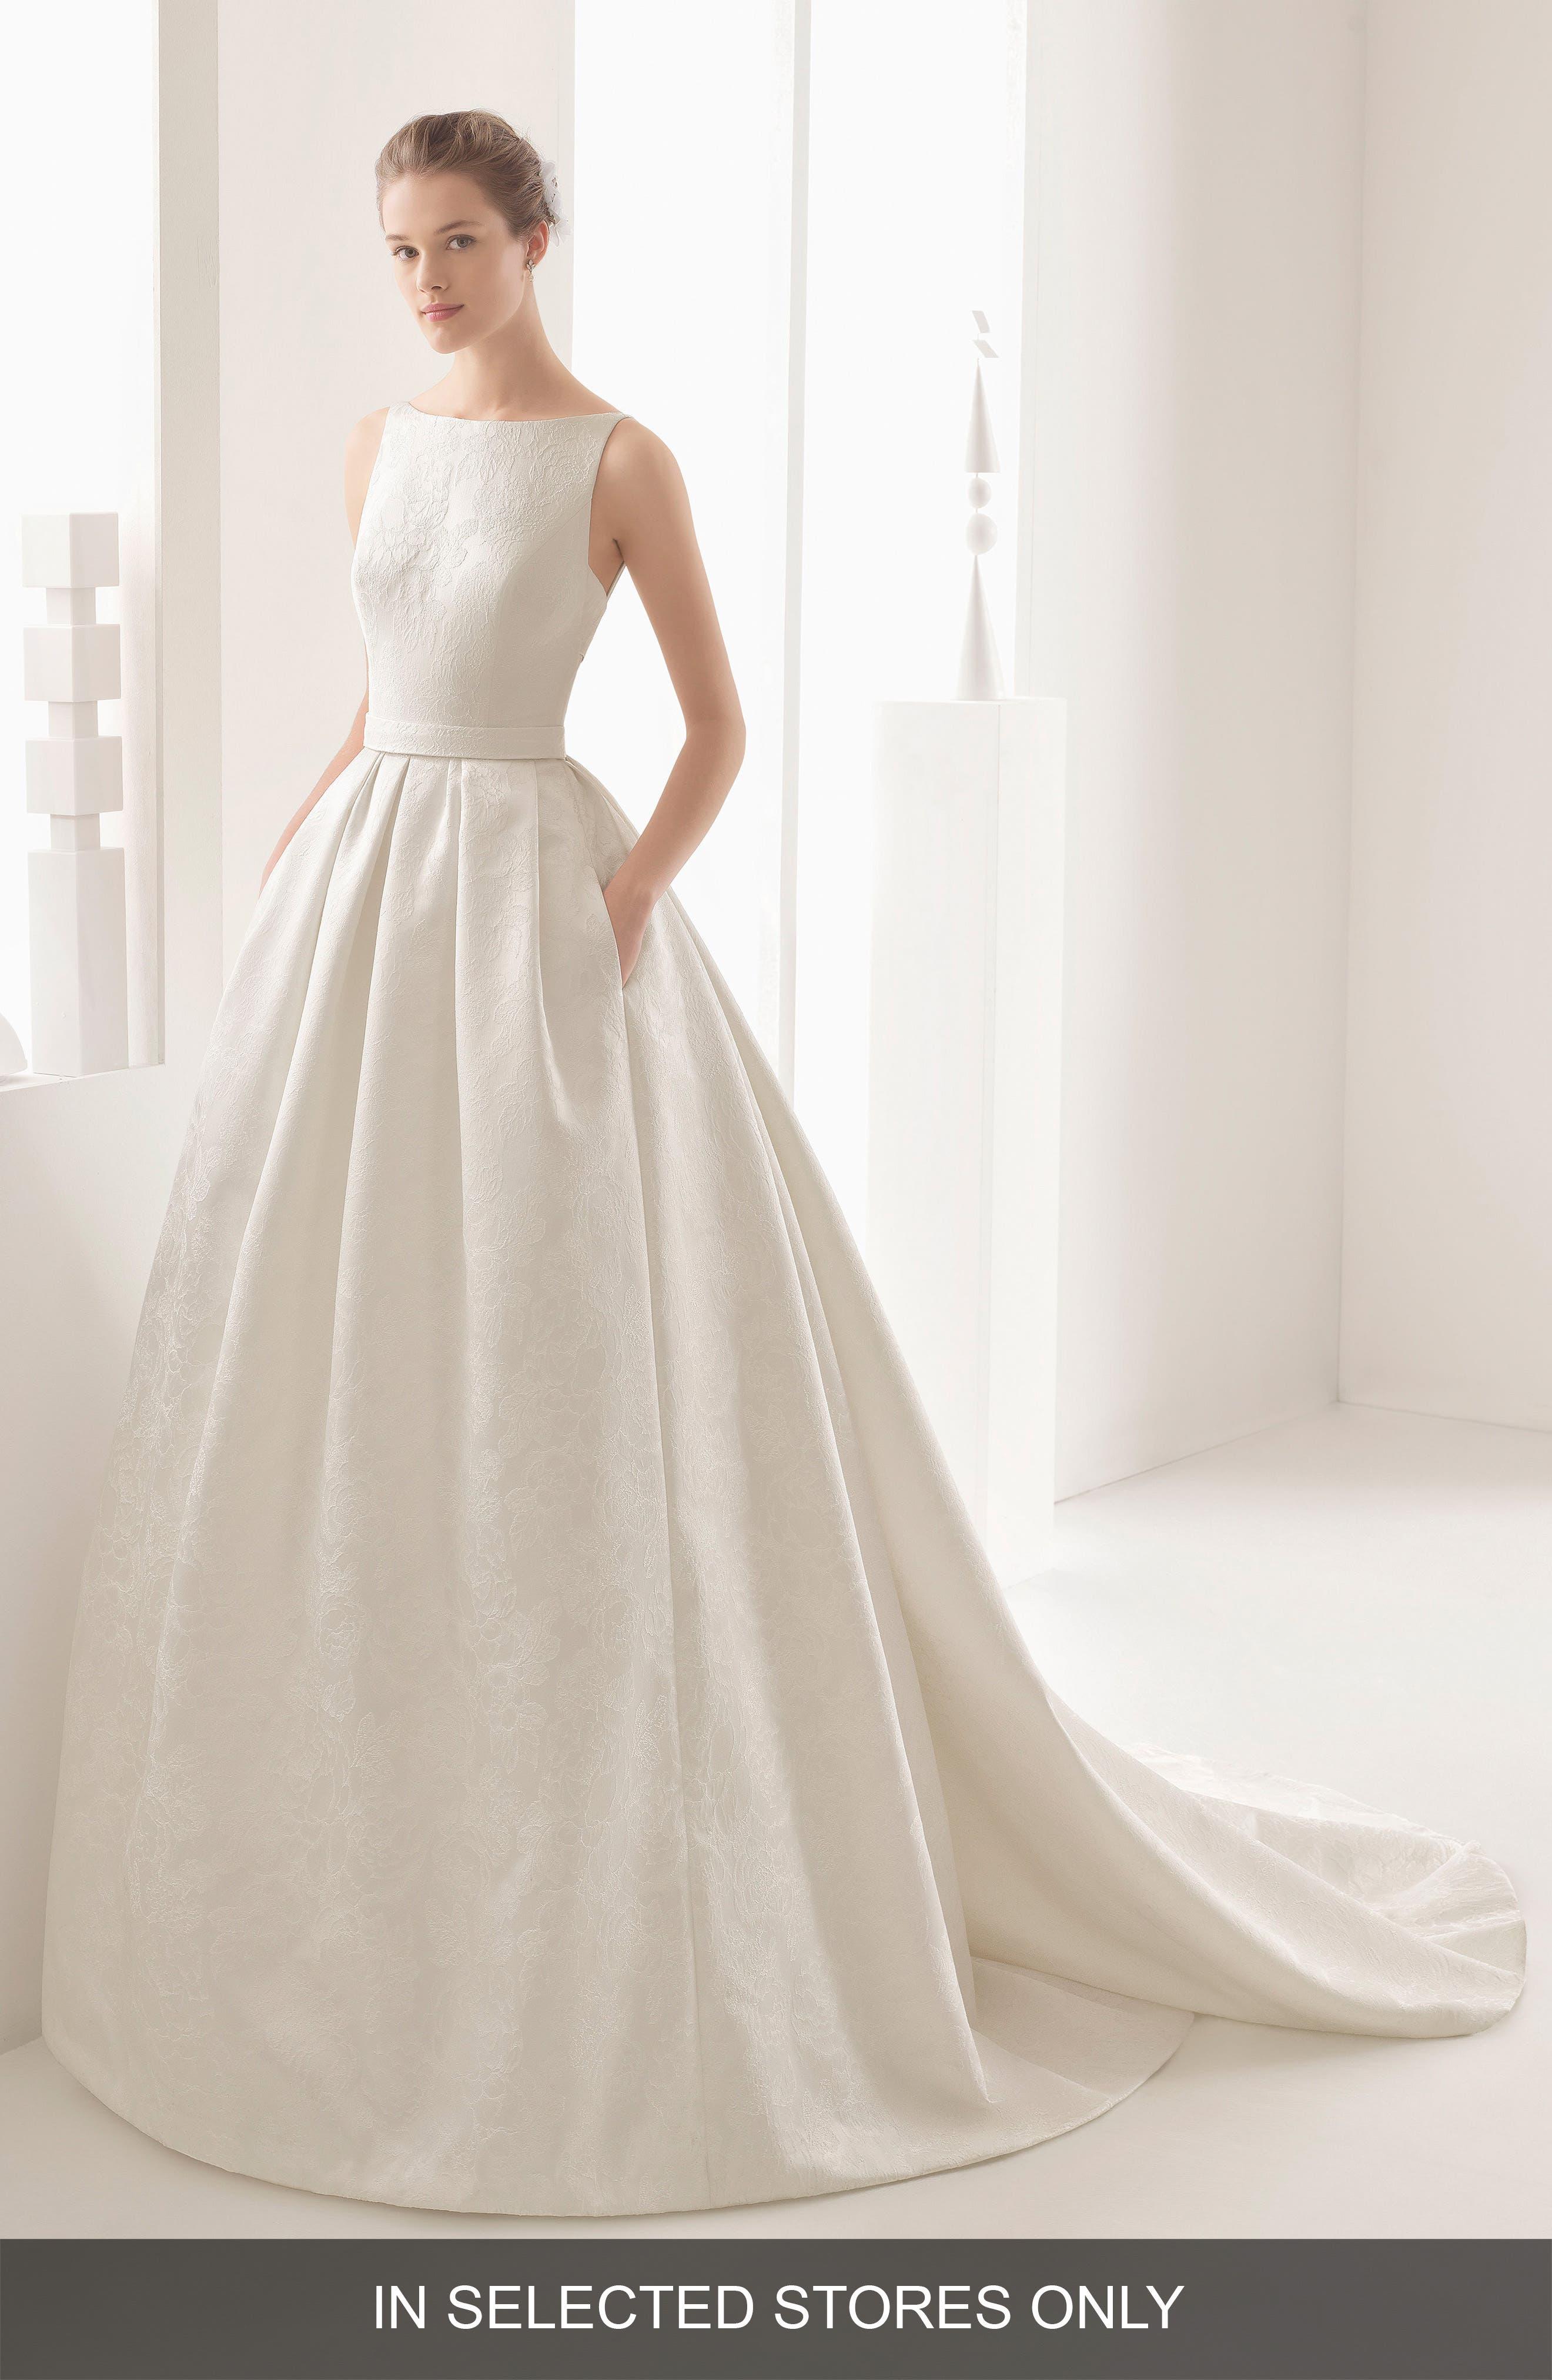 Nazar Floral Brocade Sleeveless Gown,                             Main thumbnail 1, color,                             900